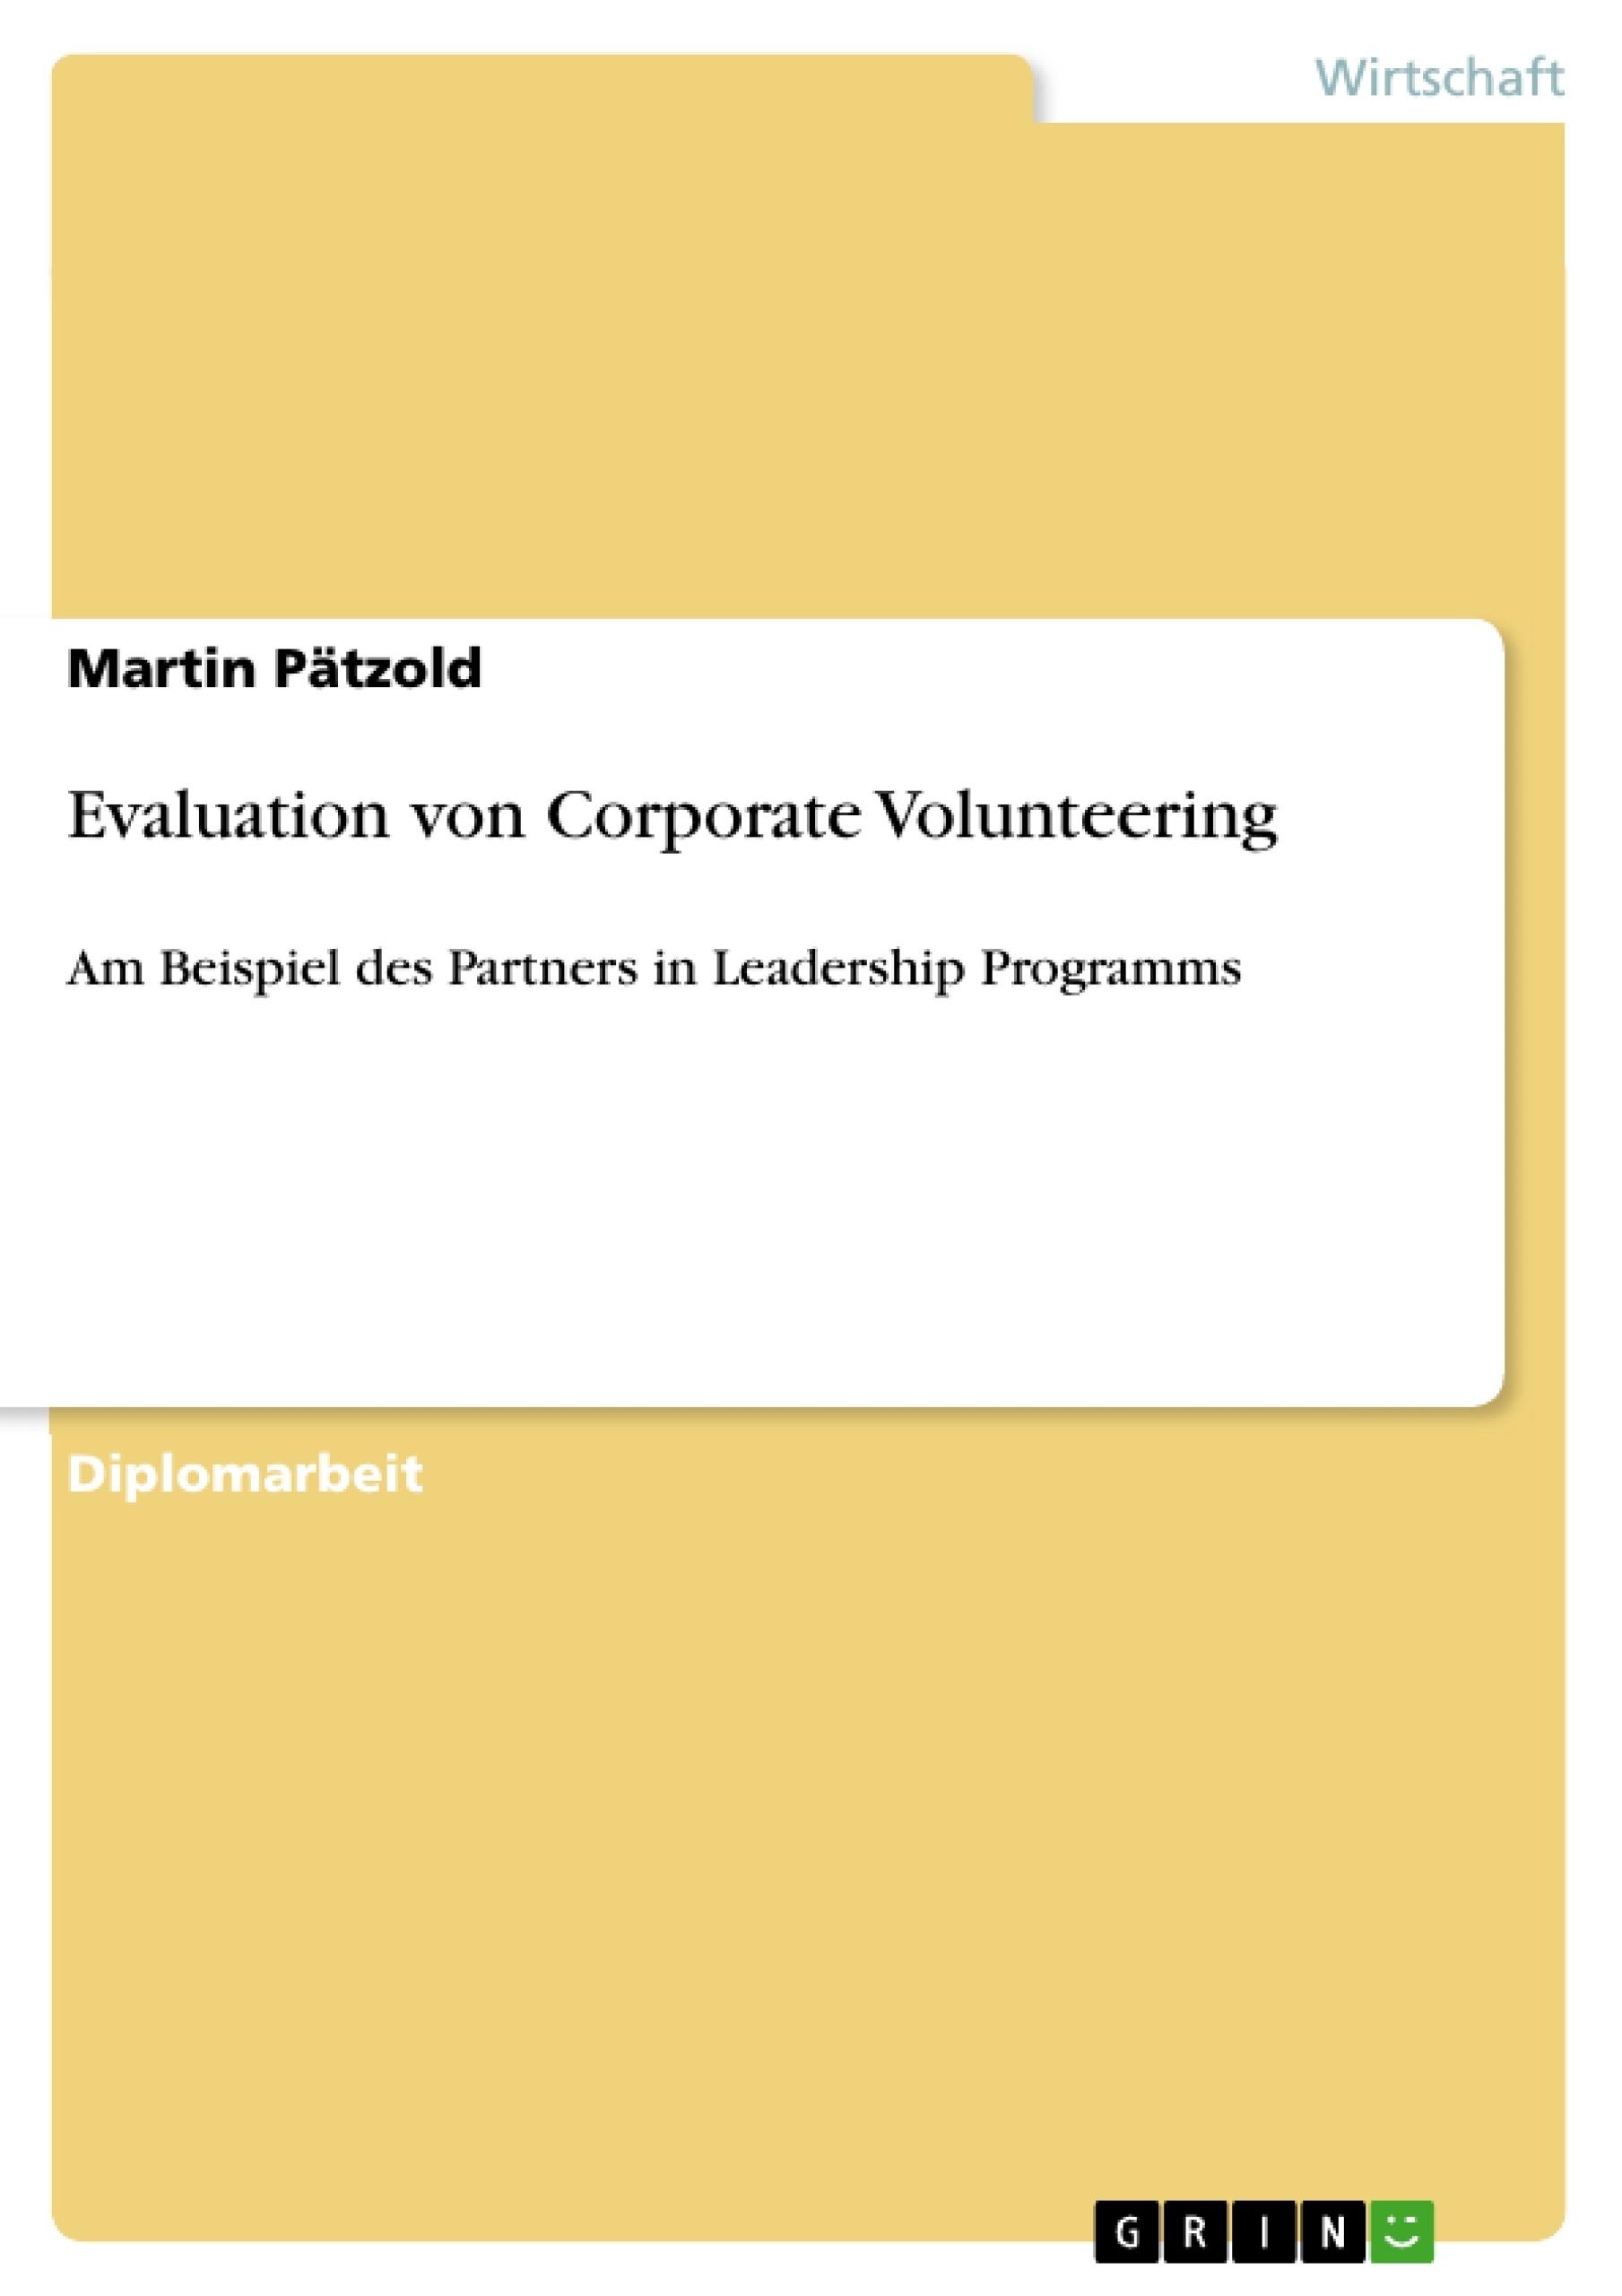 Titel: Evaluation von Corporate Volunteering